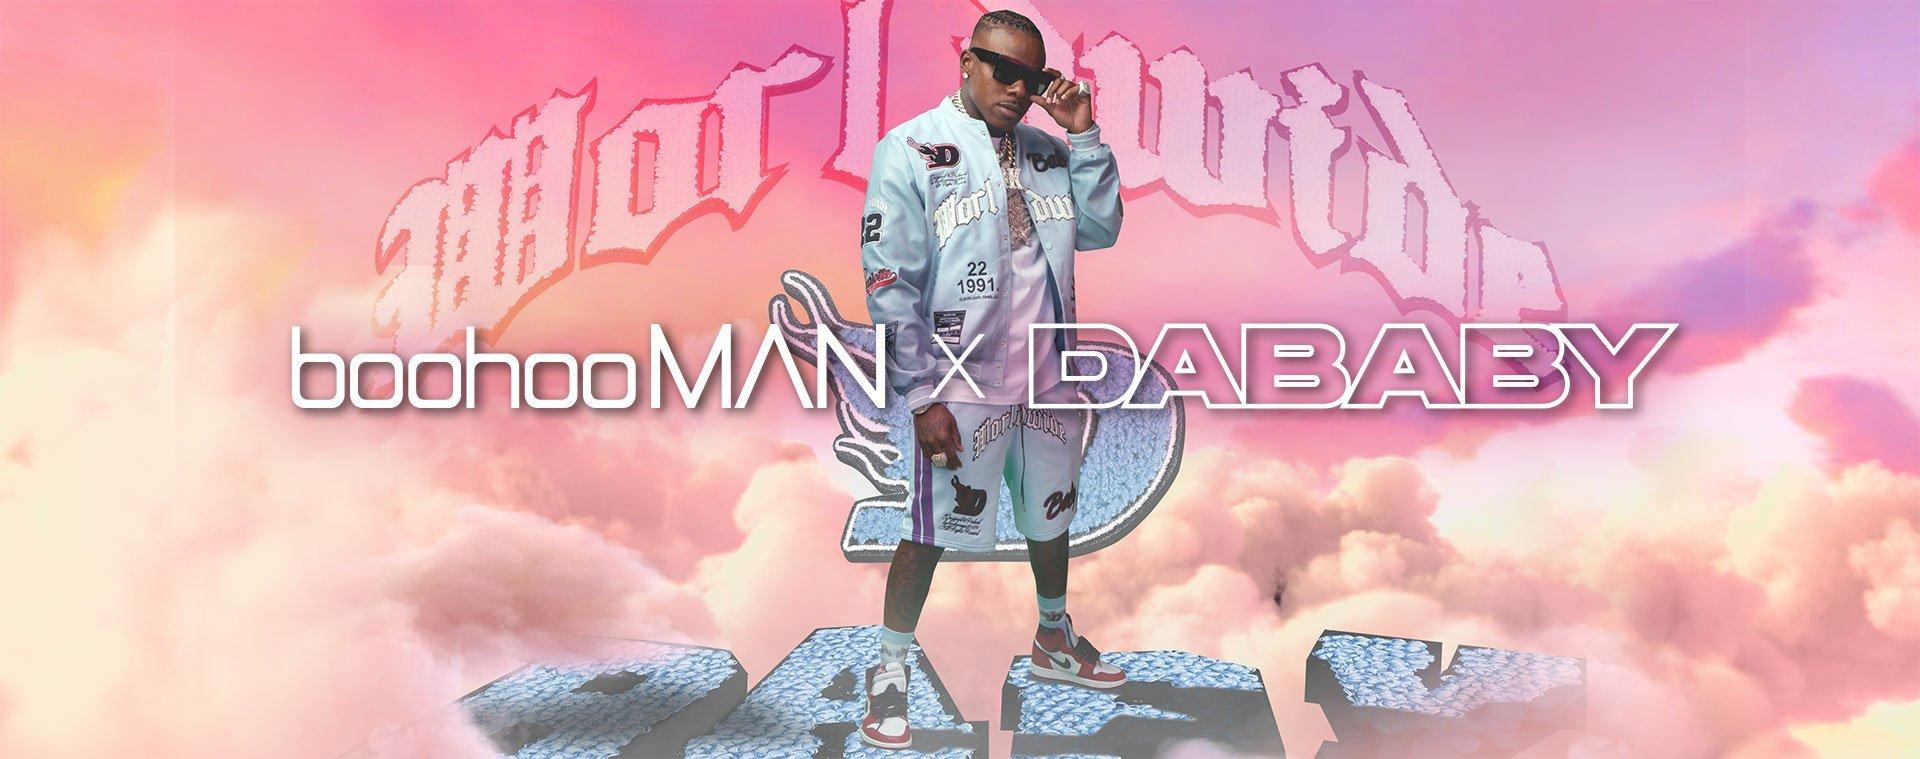 boohooMAN x DaBaby